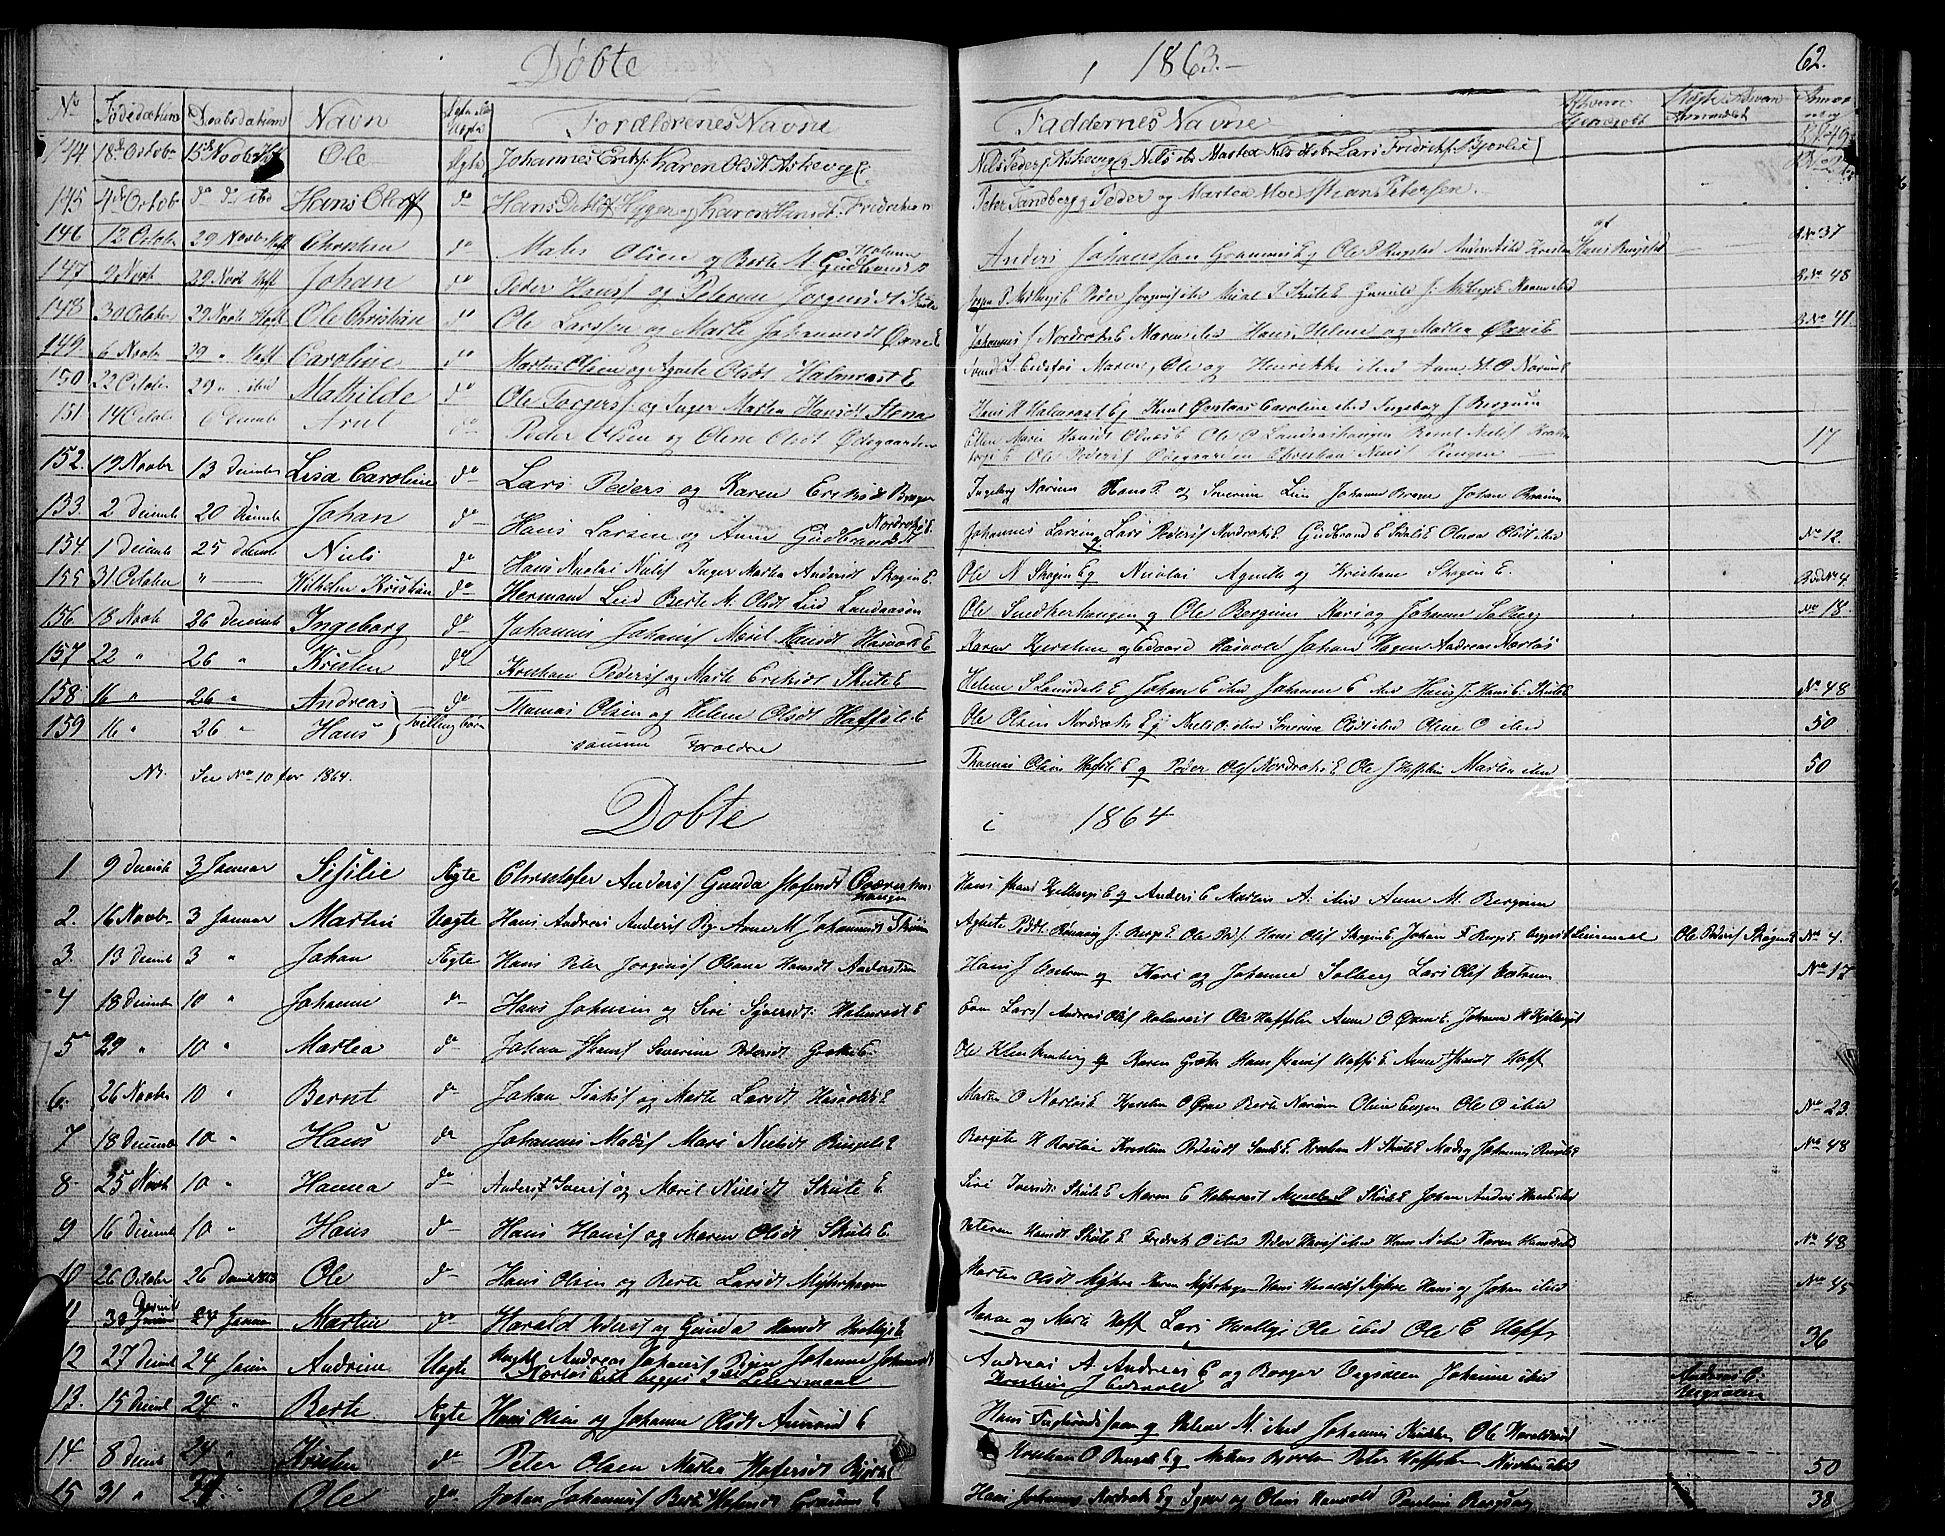 SAH, Søndre Land prestekontor, L/L0001: Klokkerbok nr. 1, 1849-1883, s. 62